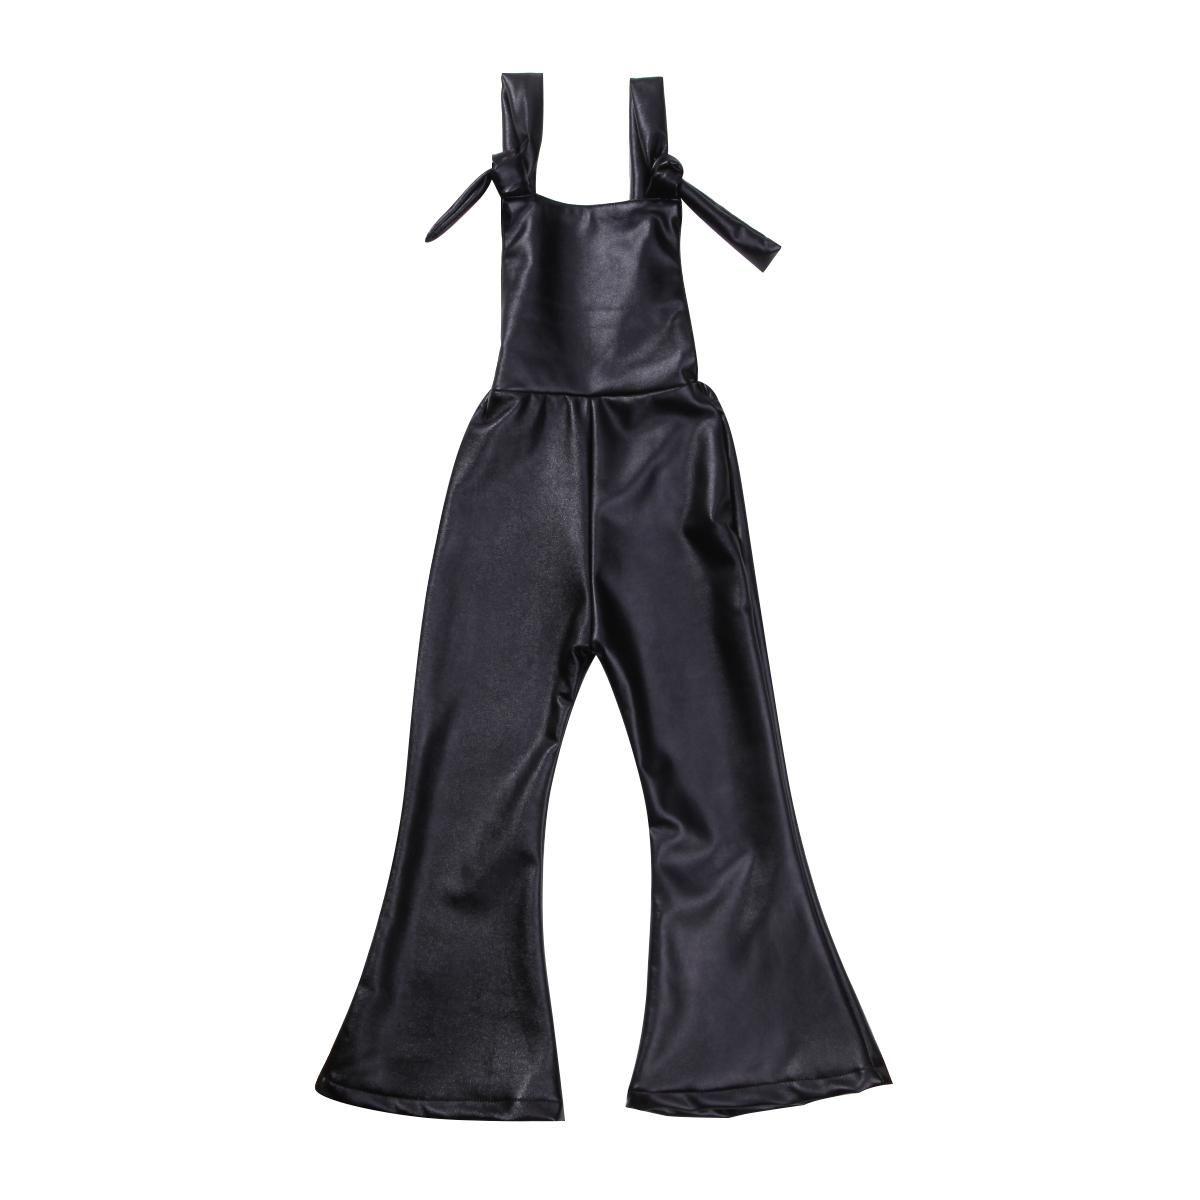 530dac55ed8b New Fashion Kids Rompers Infant Baby Girl Sleeveless Jumpsuit Kid ...